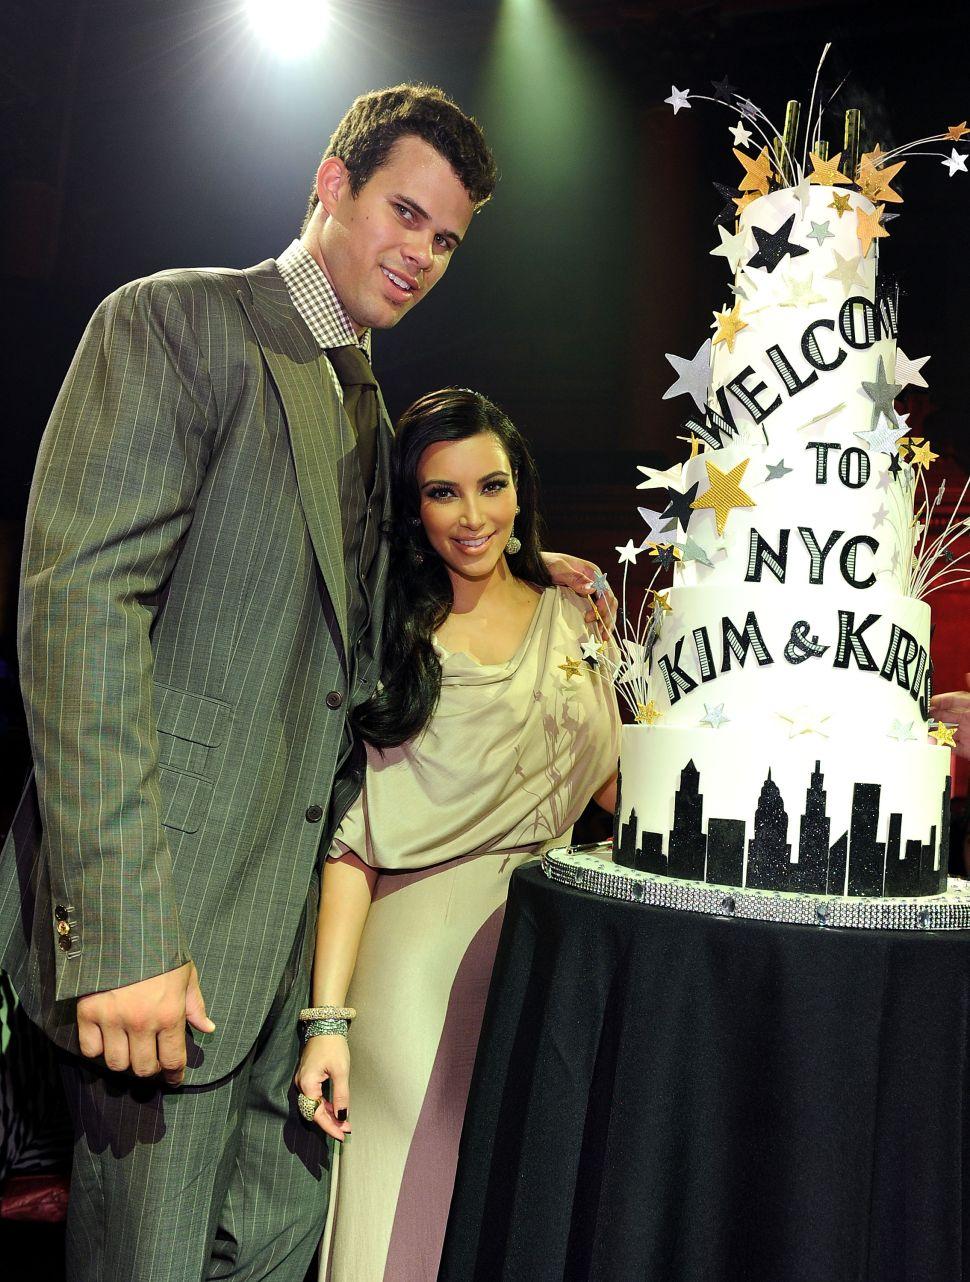 Kris Humphries Refuses to Divorce Kim Kardashian